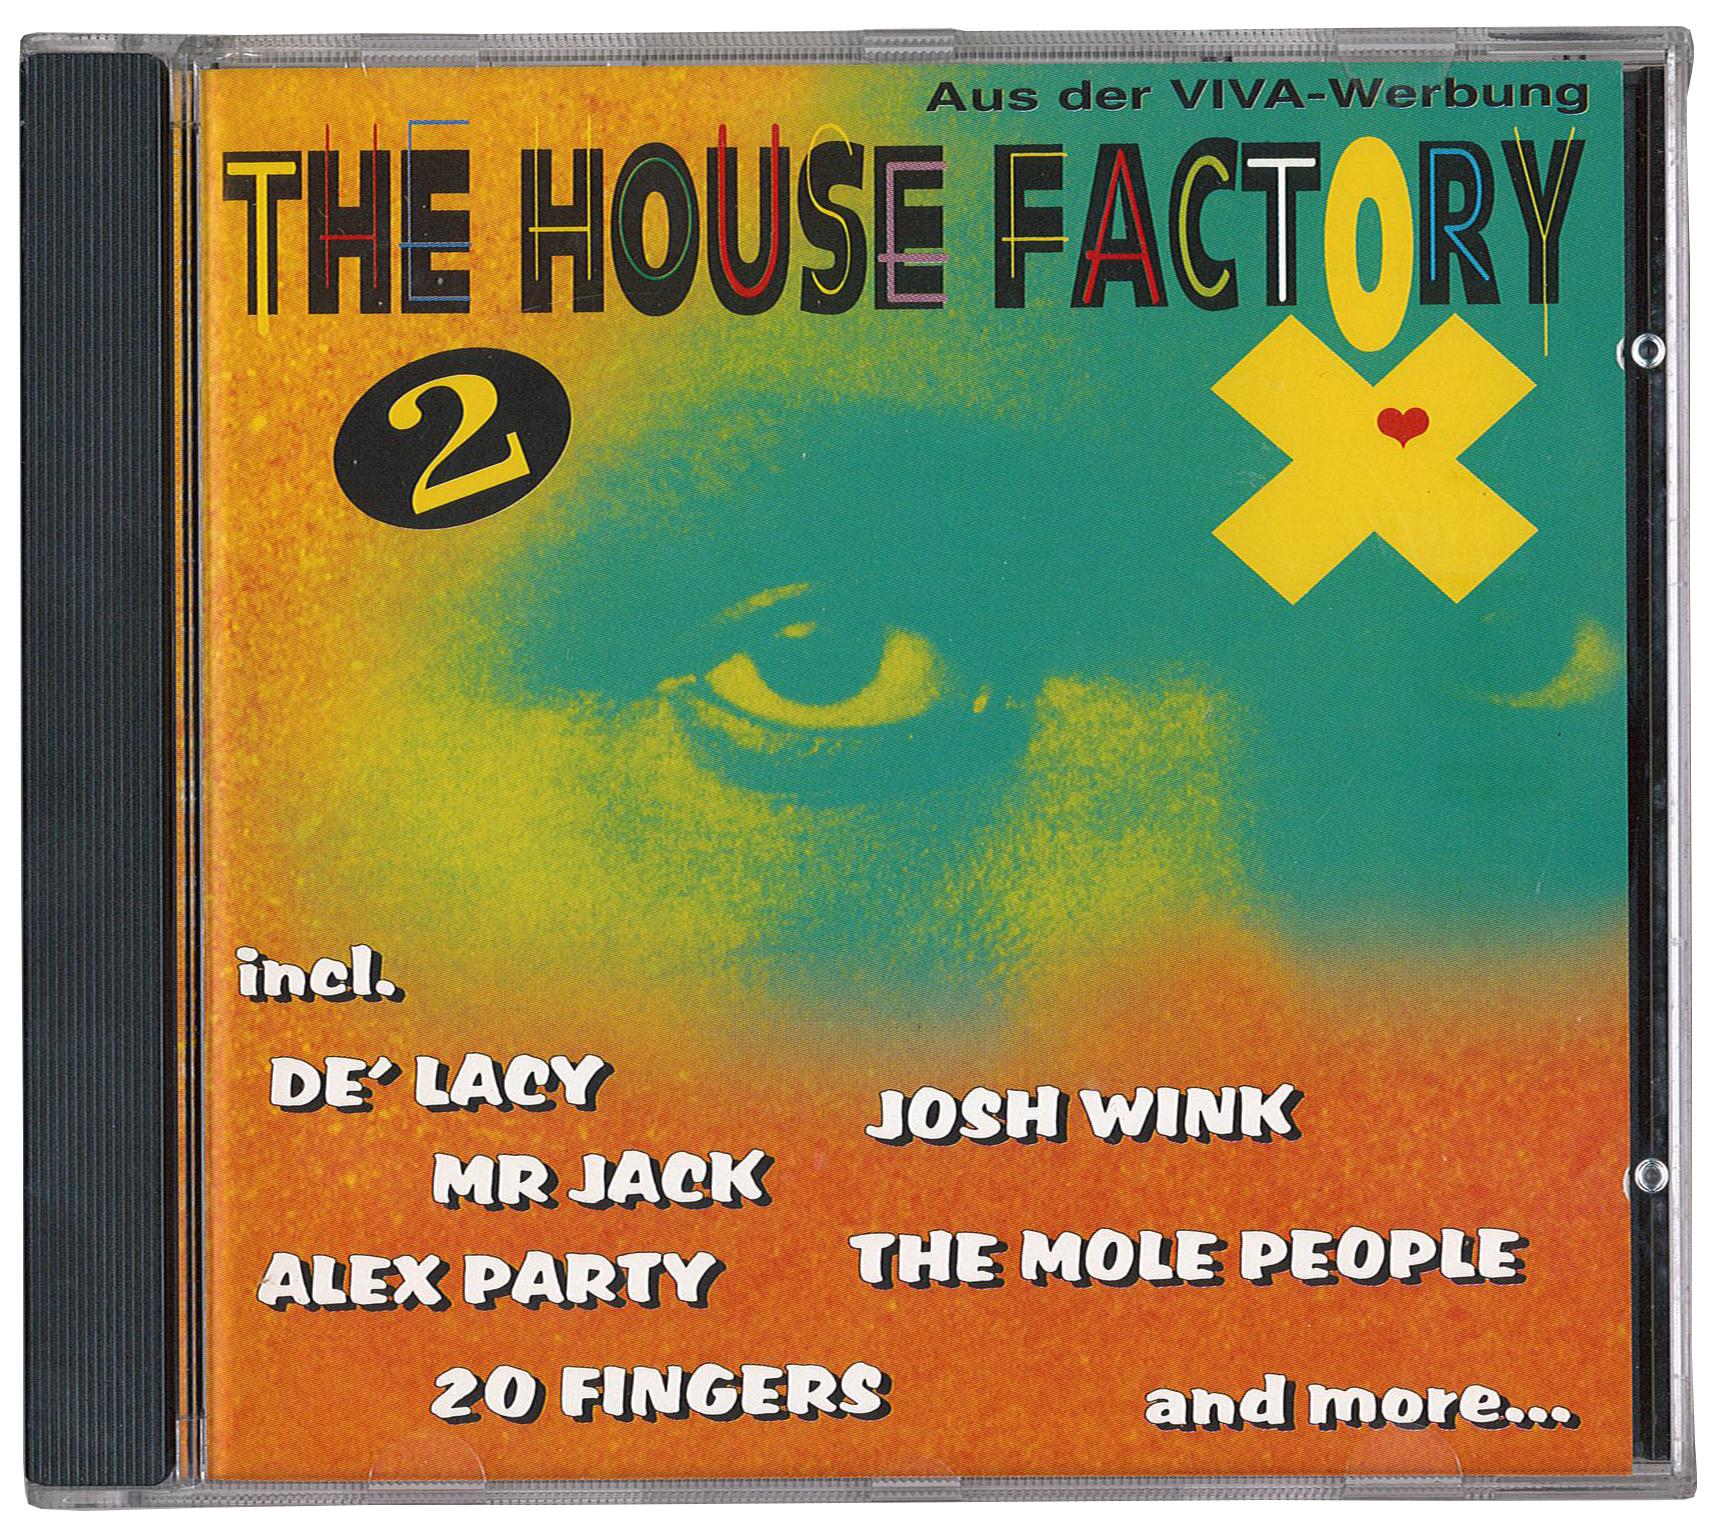 WLWLTDOO-1995-CD-HOUSE_FACTORY_2-XYZ-55033-2-FRONT.jpg